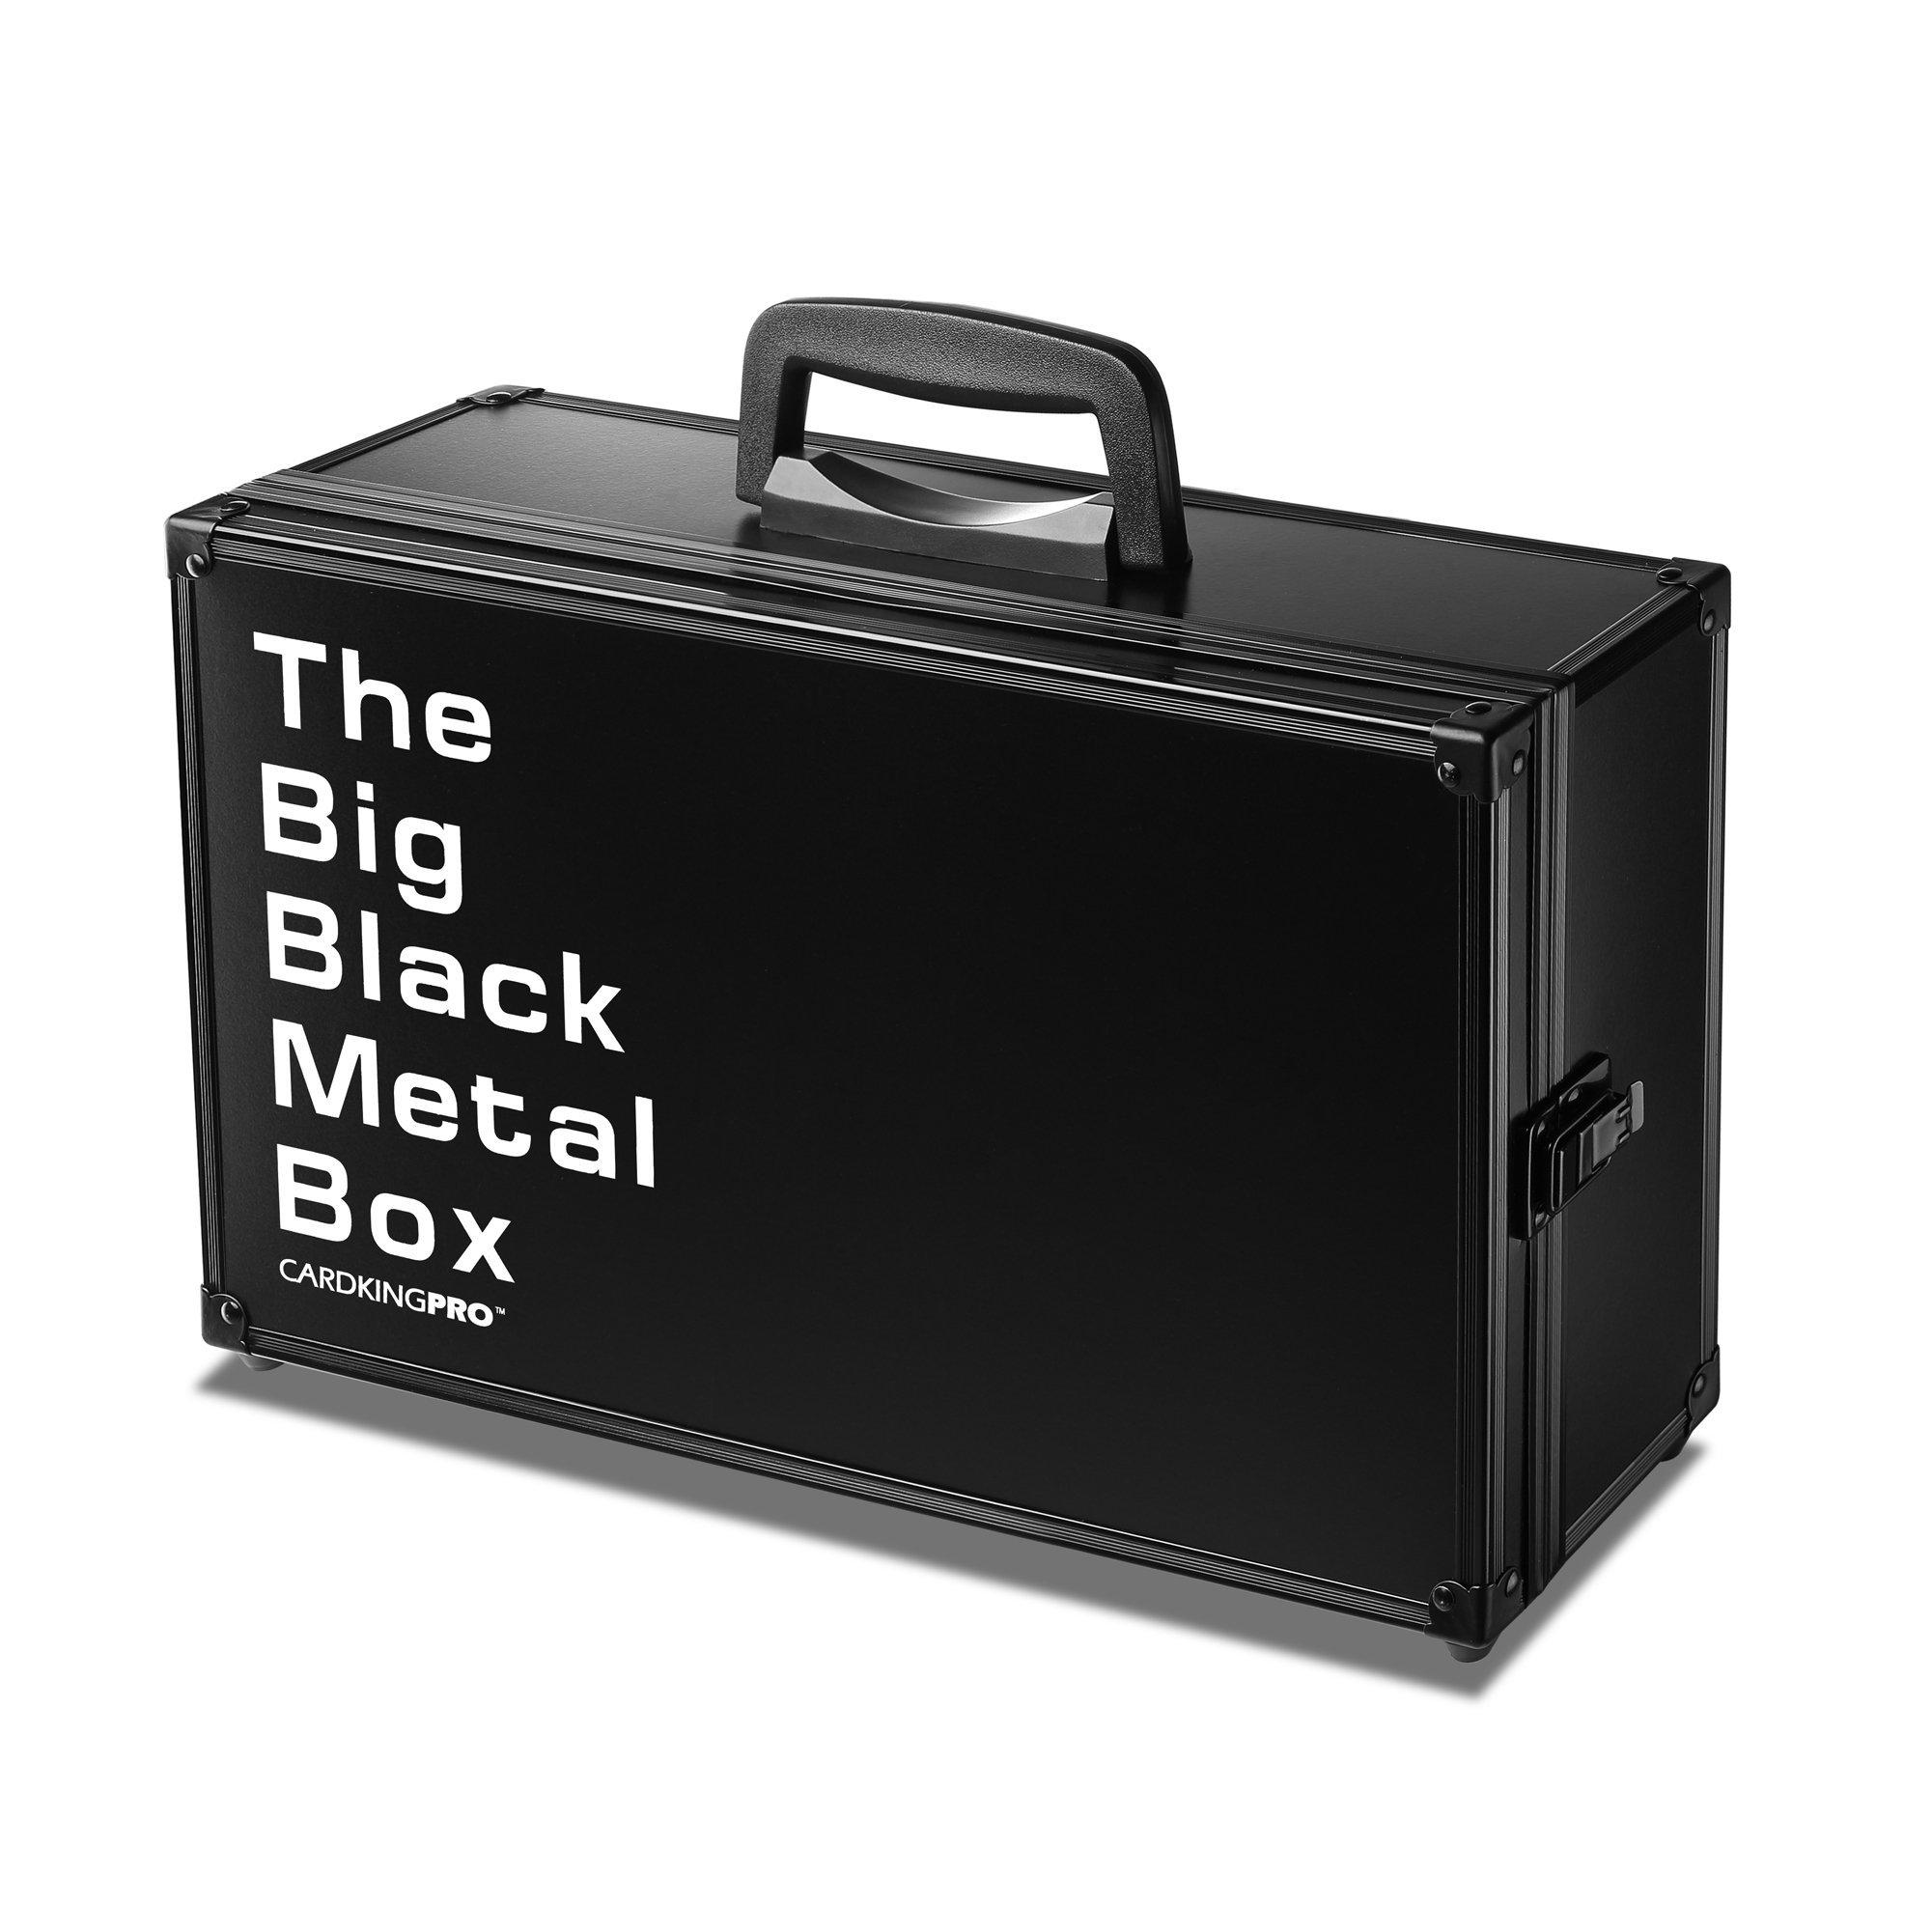 Cardkingpro RPG Game Storage Case BBB Large With The Big Black Metal Box Logo